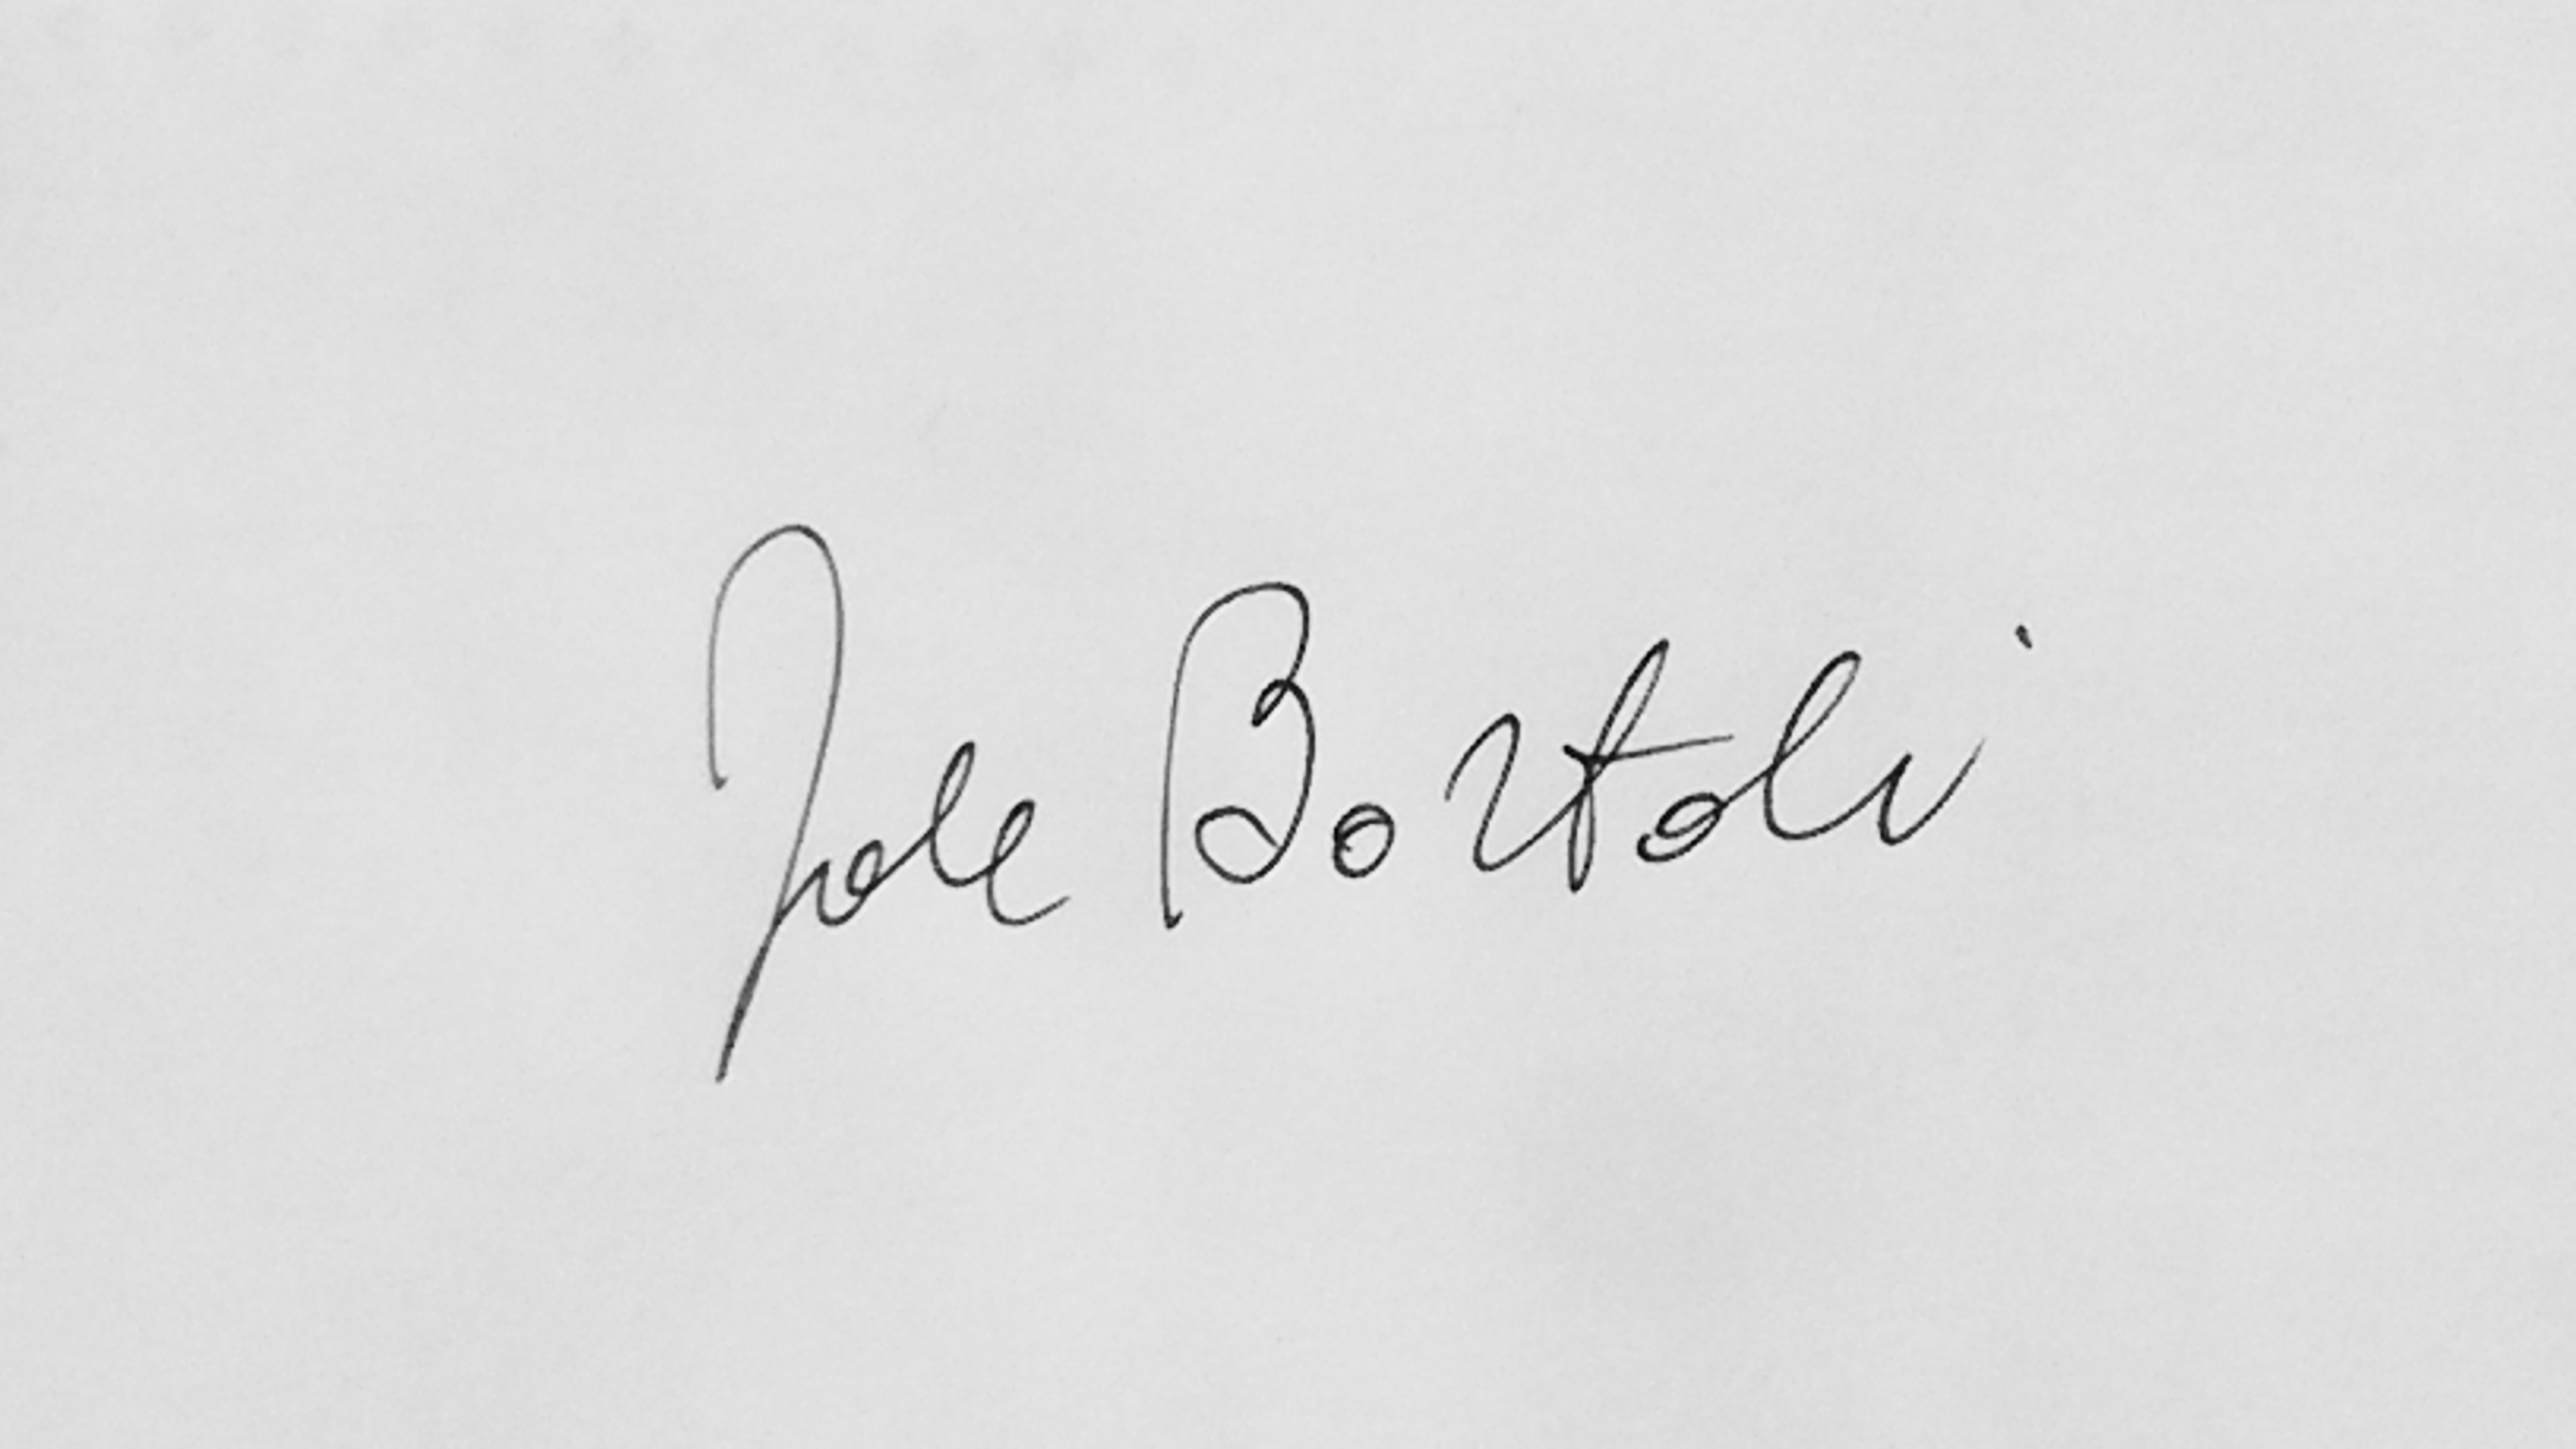 Jole Bortoli Signature